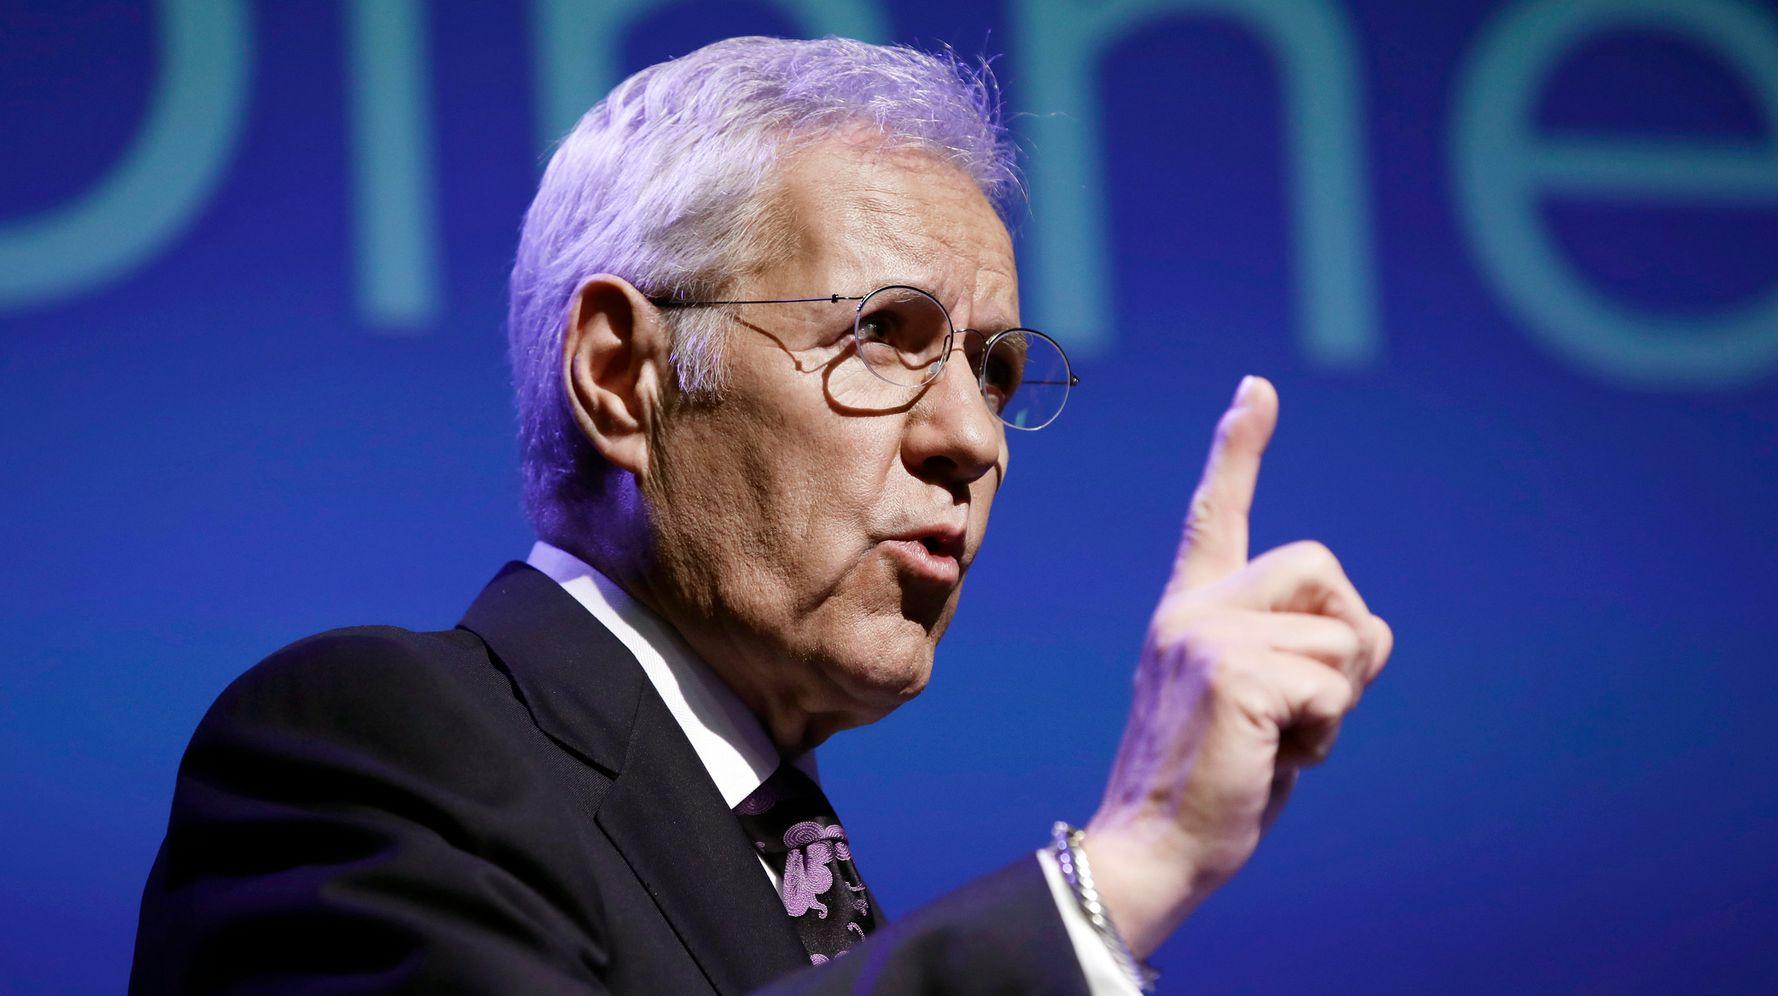 'Jeopardy!' Host Alex Trebek Dead At 80